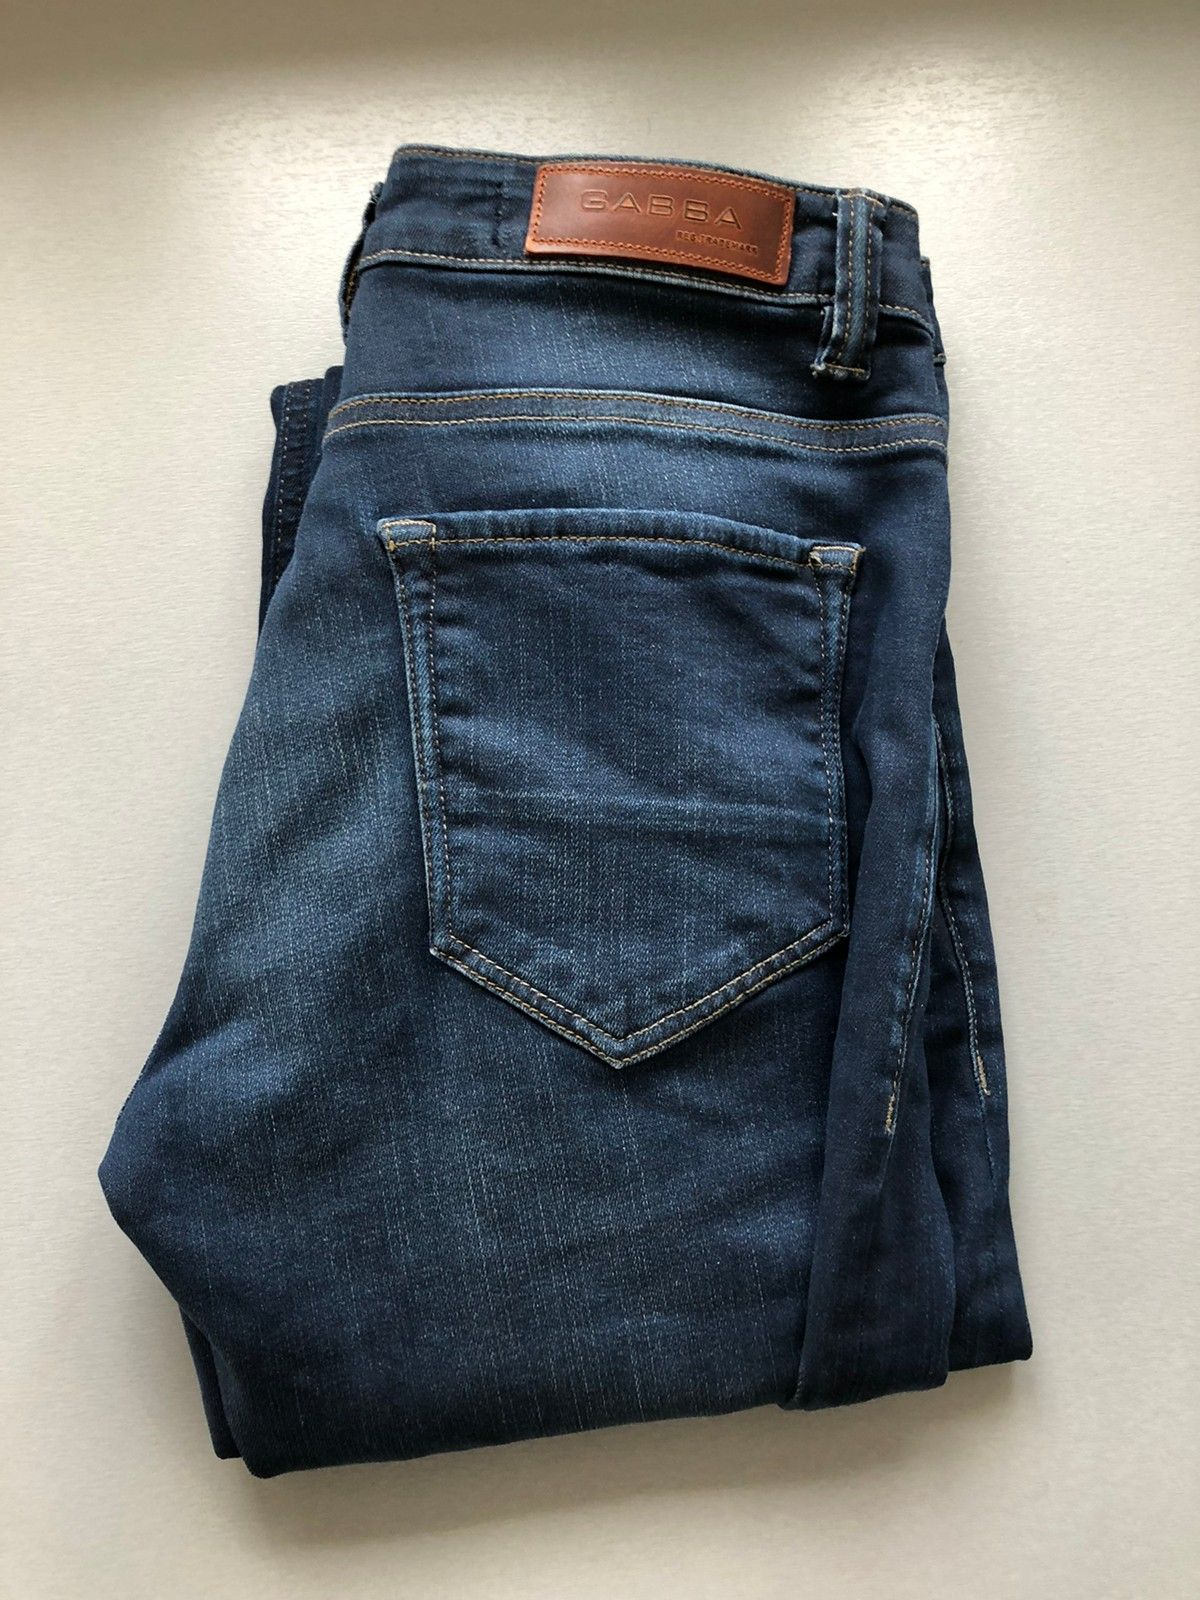 Gabba jeans olabukse   FINN.no